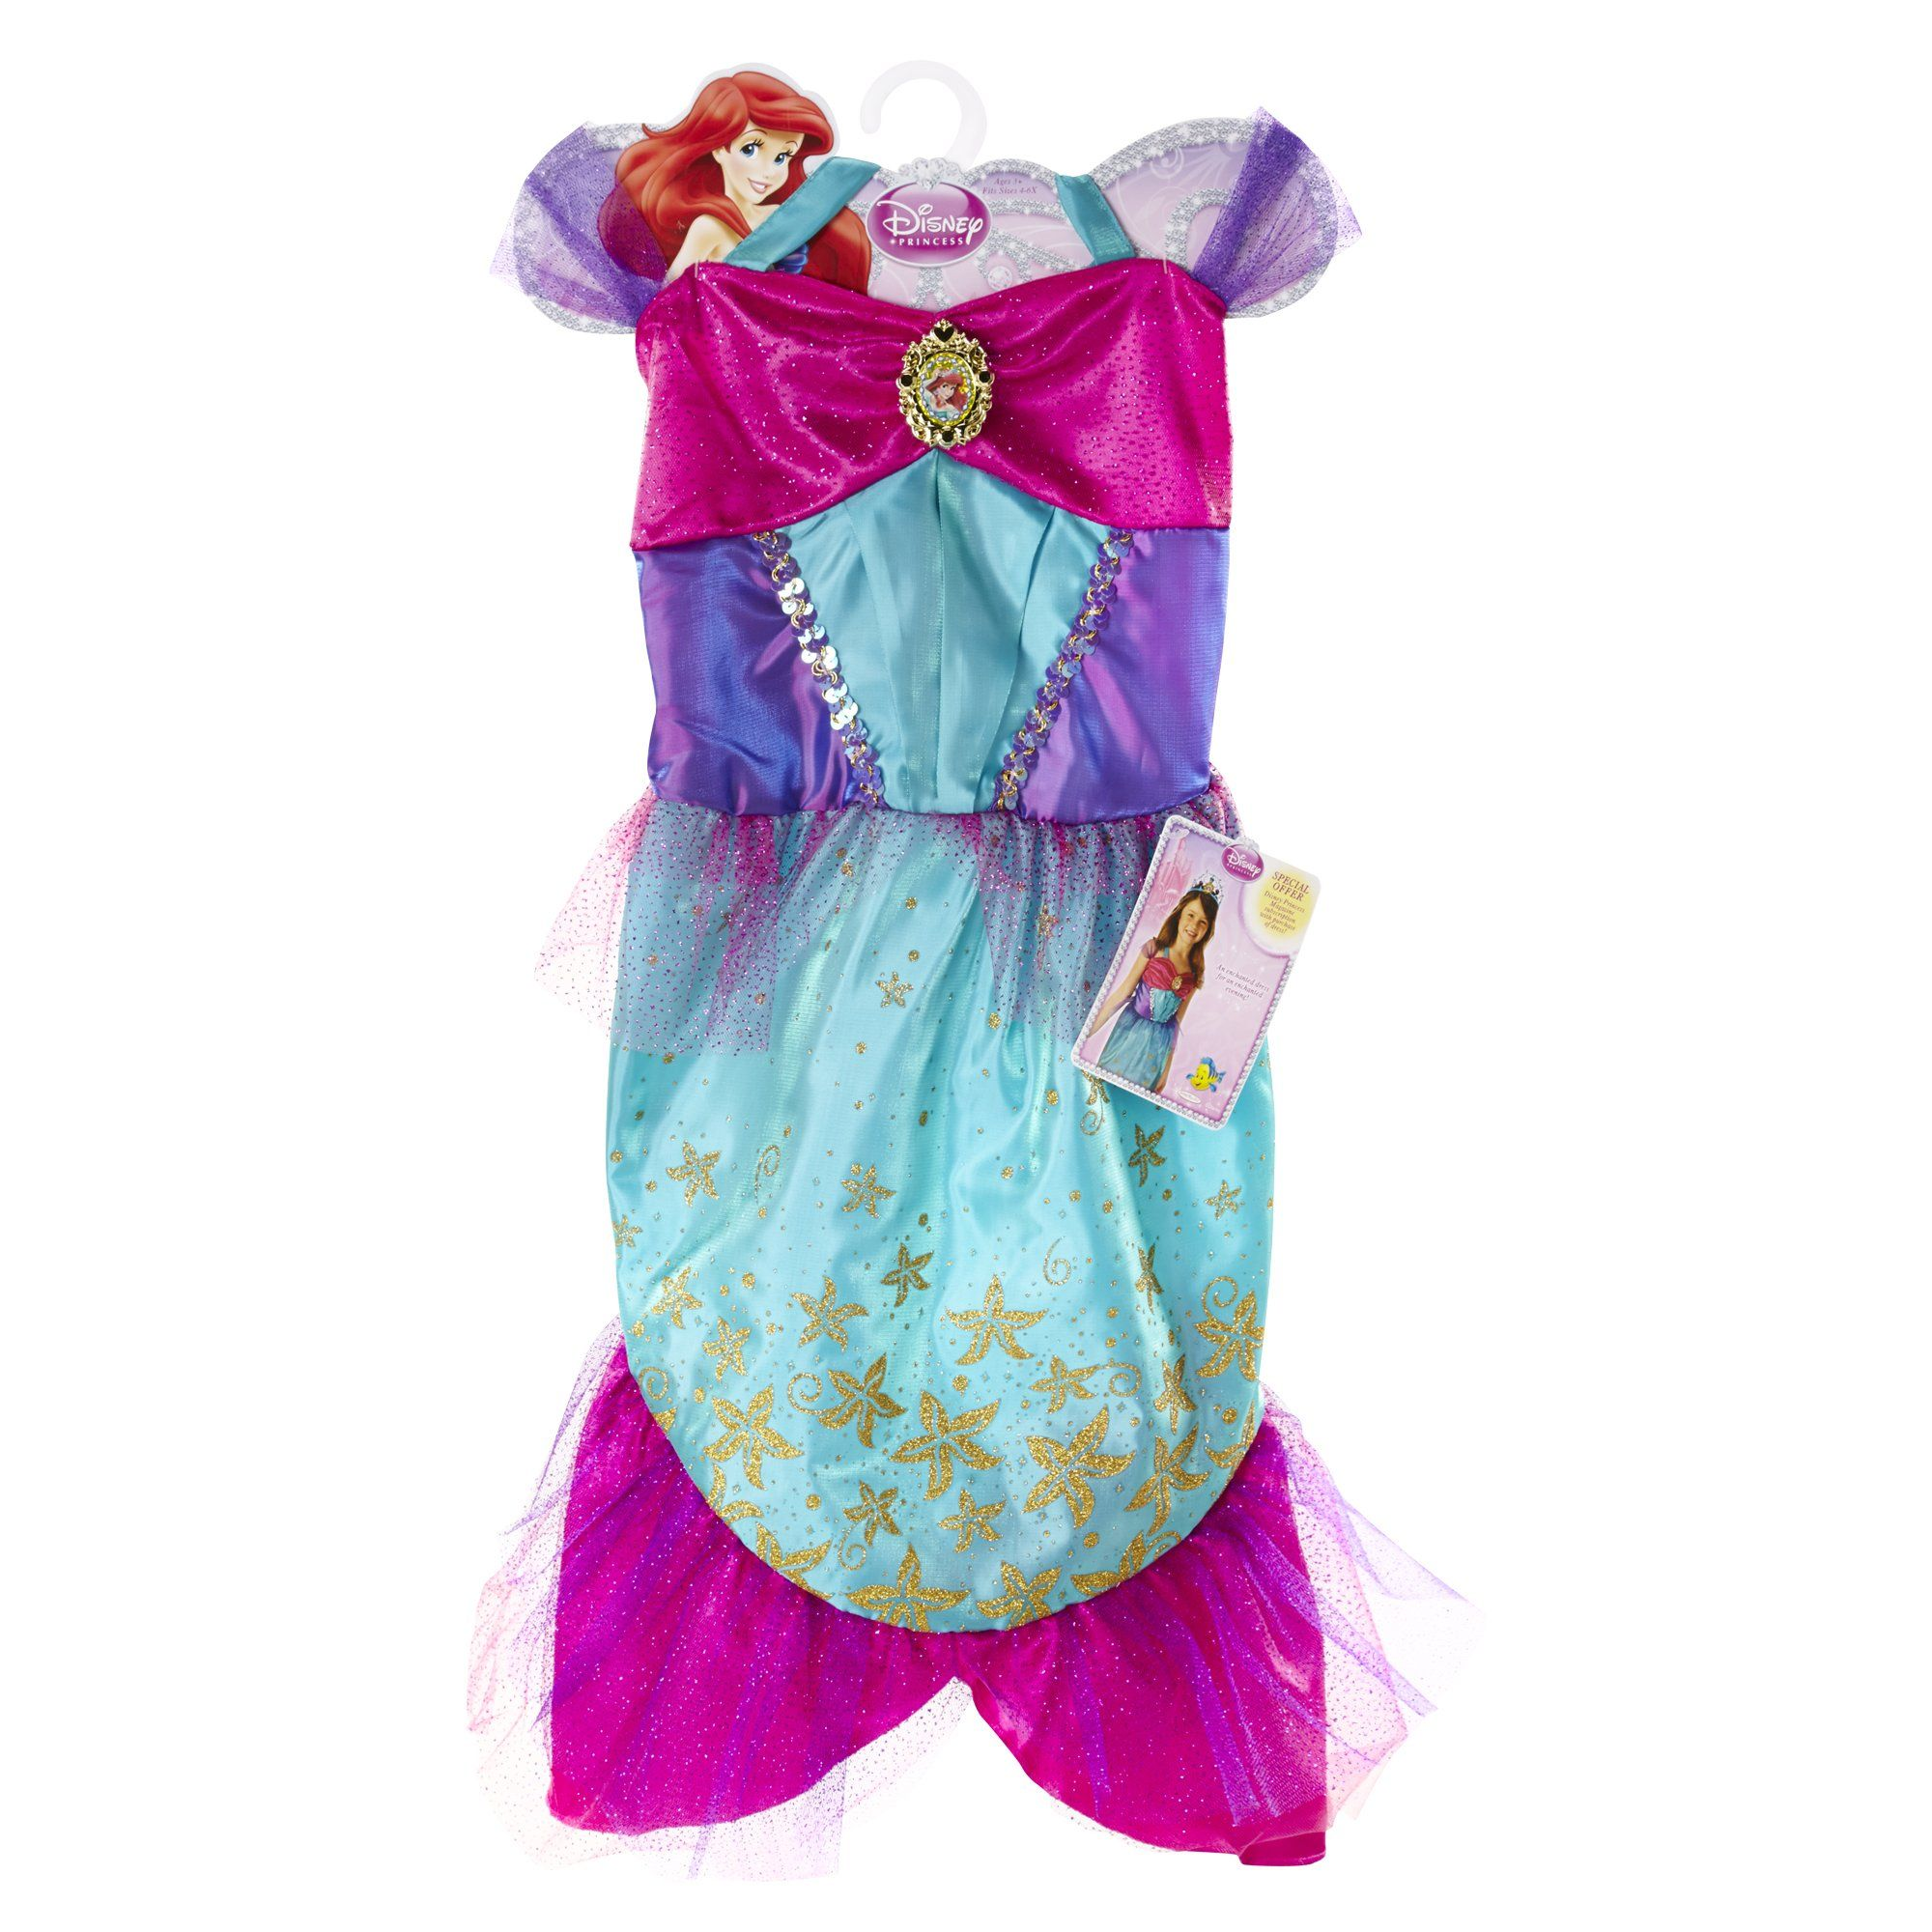 Amazon.com: Disney Princess Enchanted Evening Dress: Ariel: Toys ...